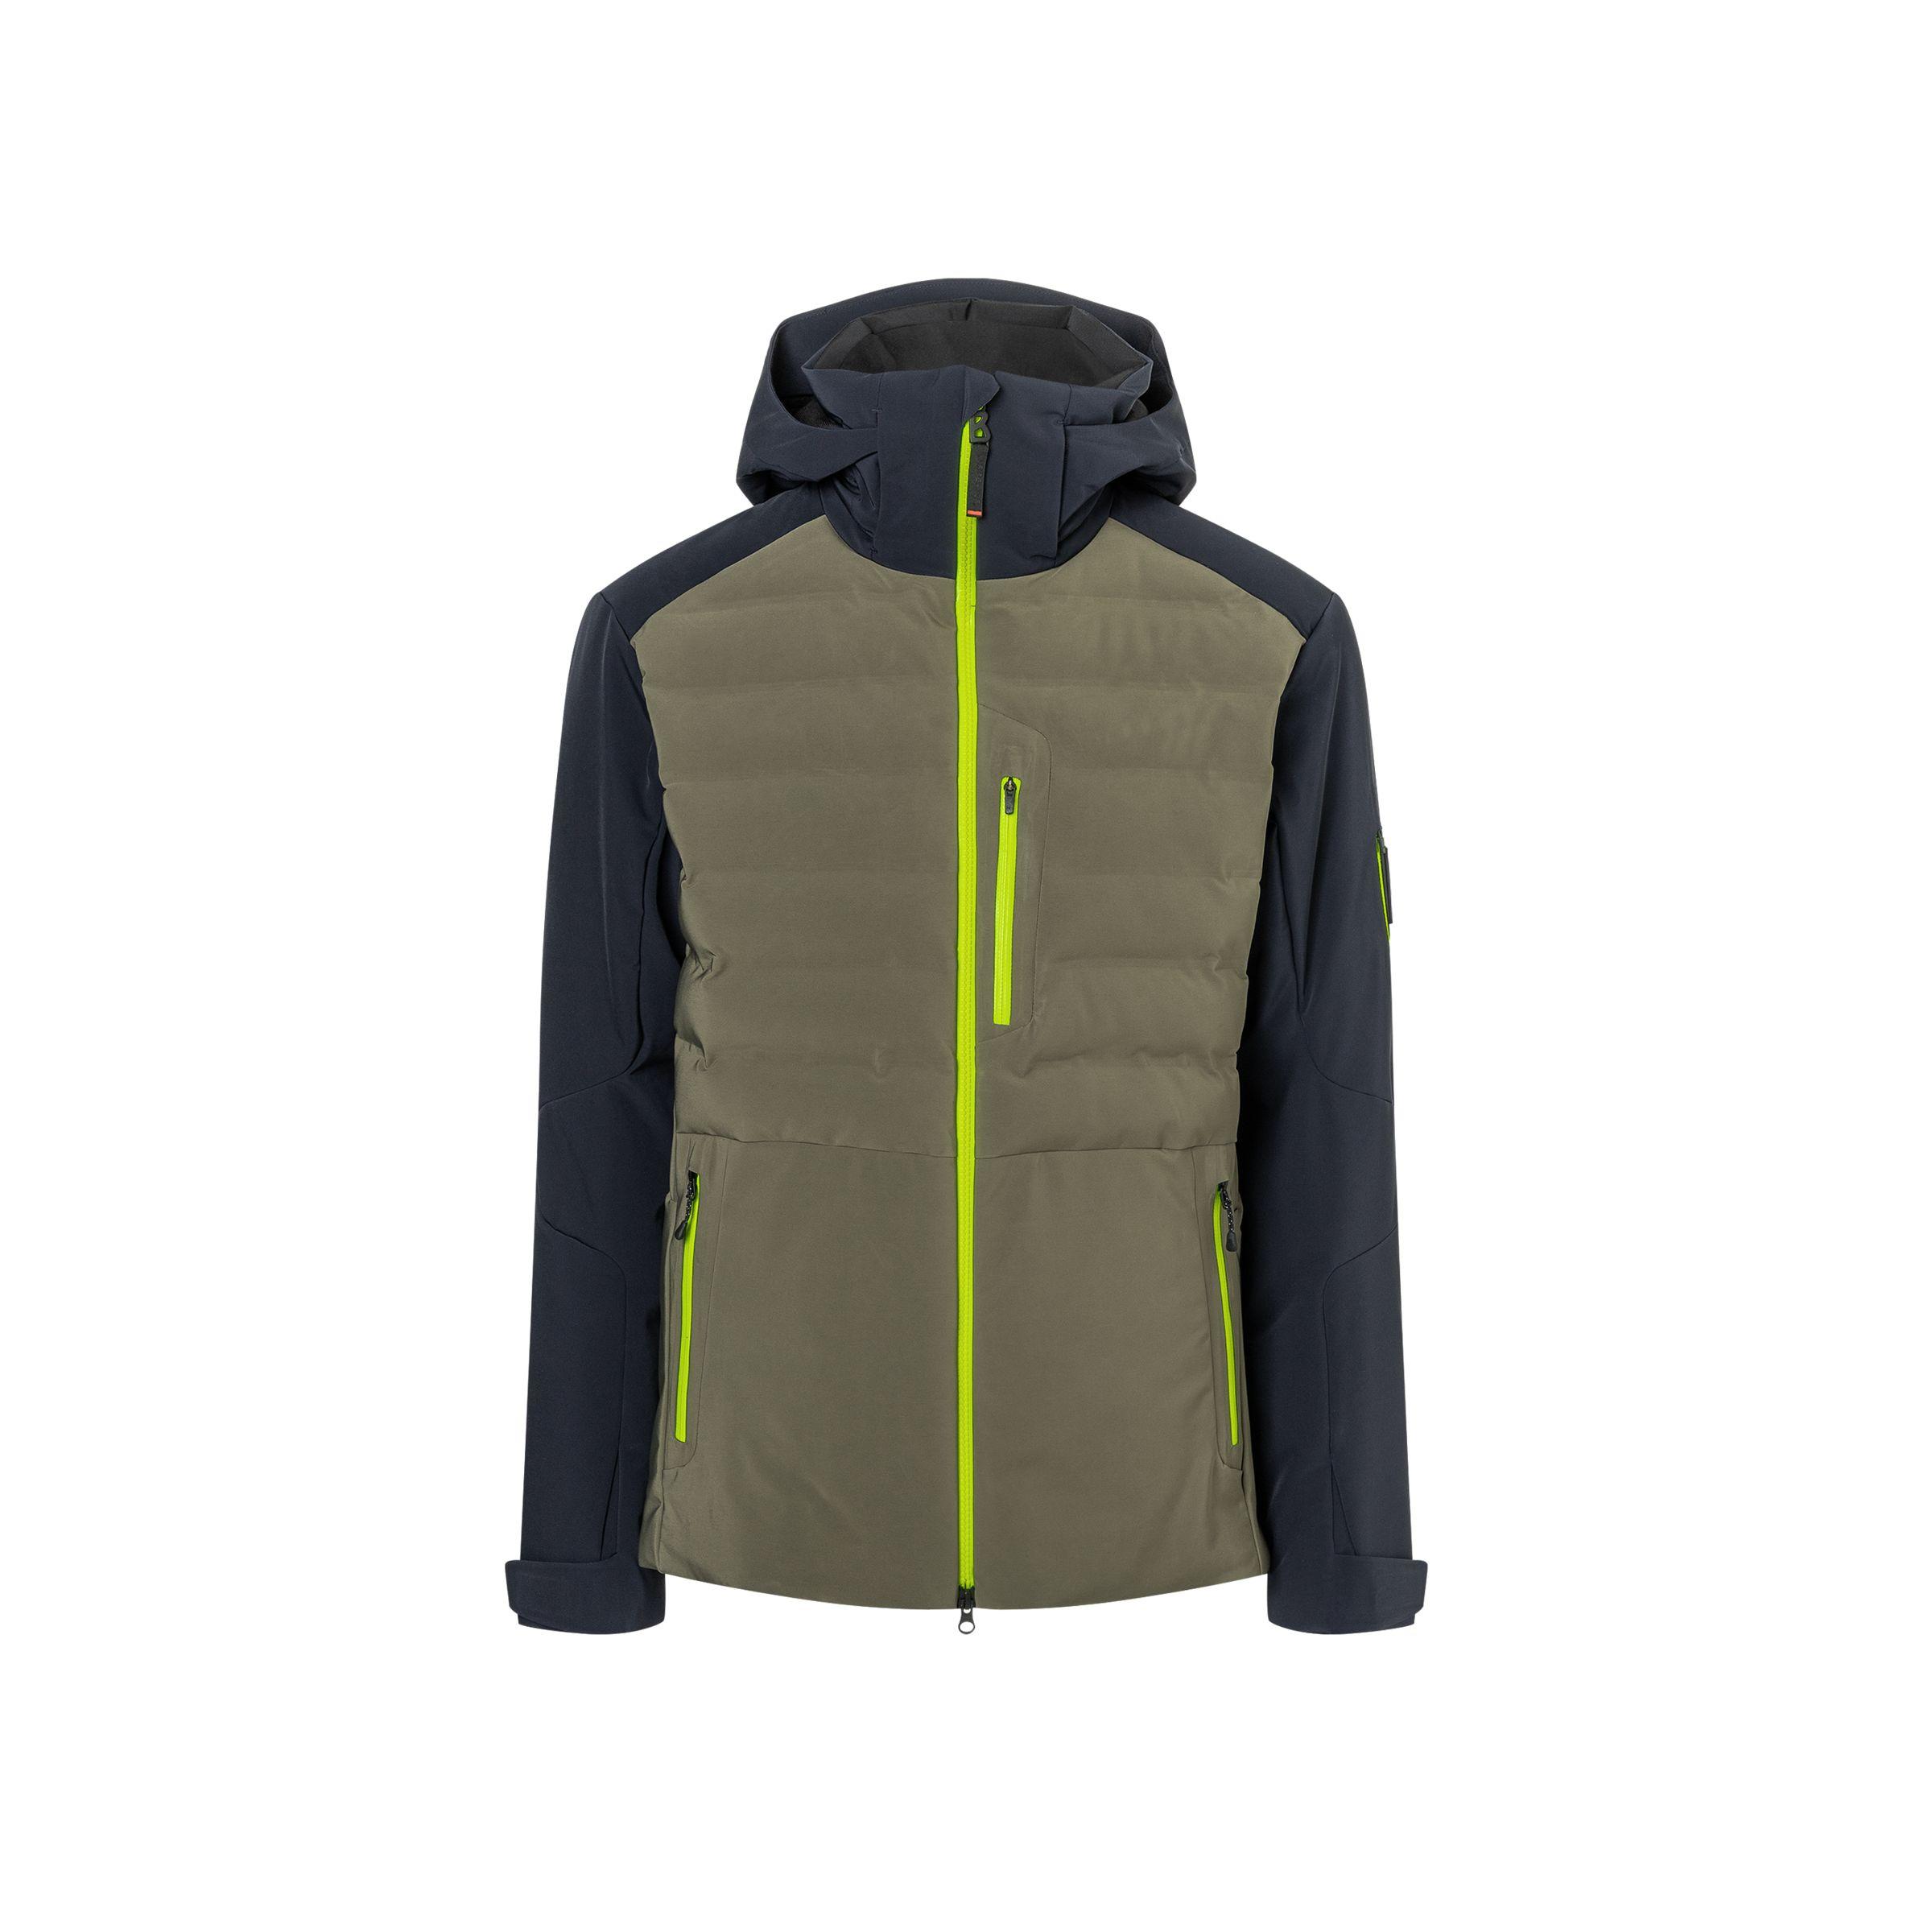 Geci Ski & Snow -  bogner fire and ice IVO Ski Jacket